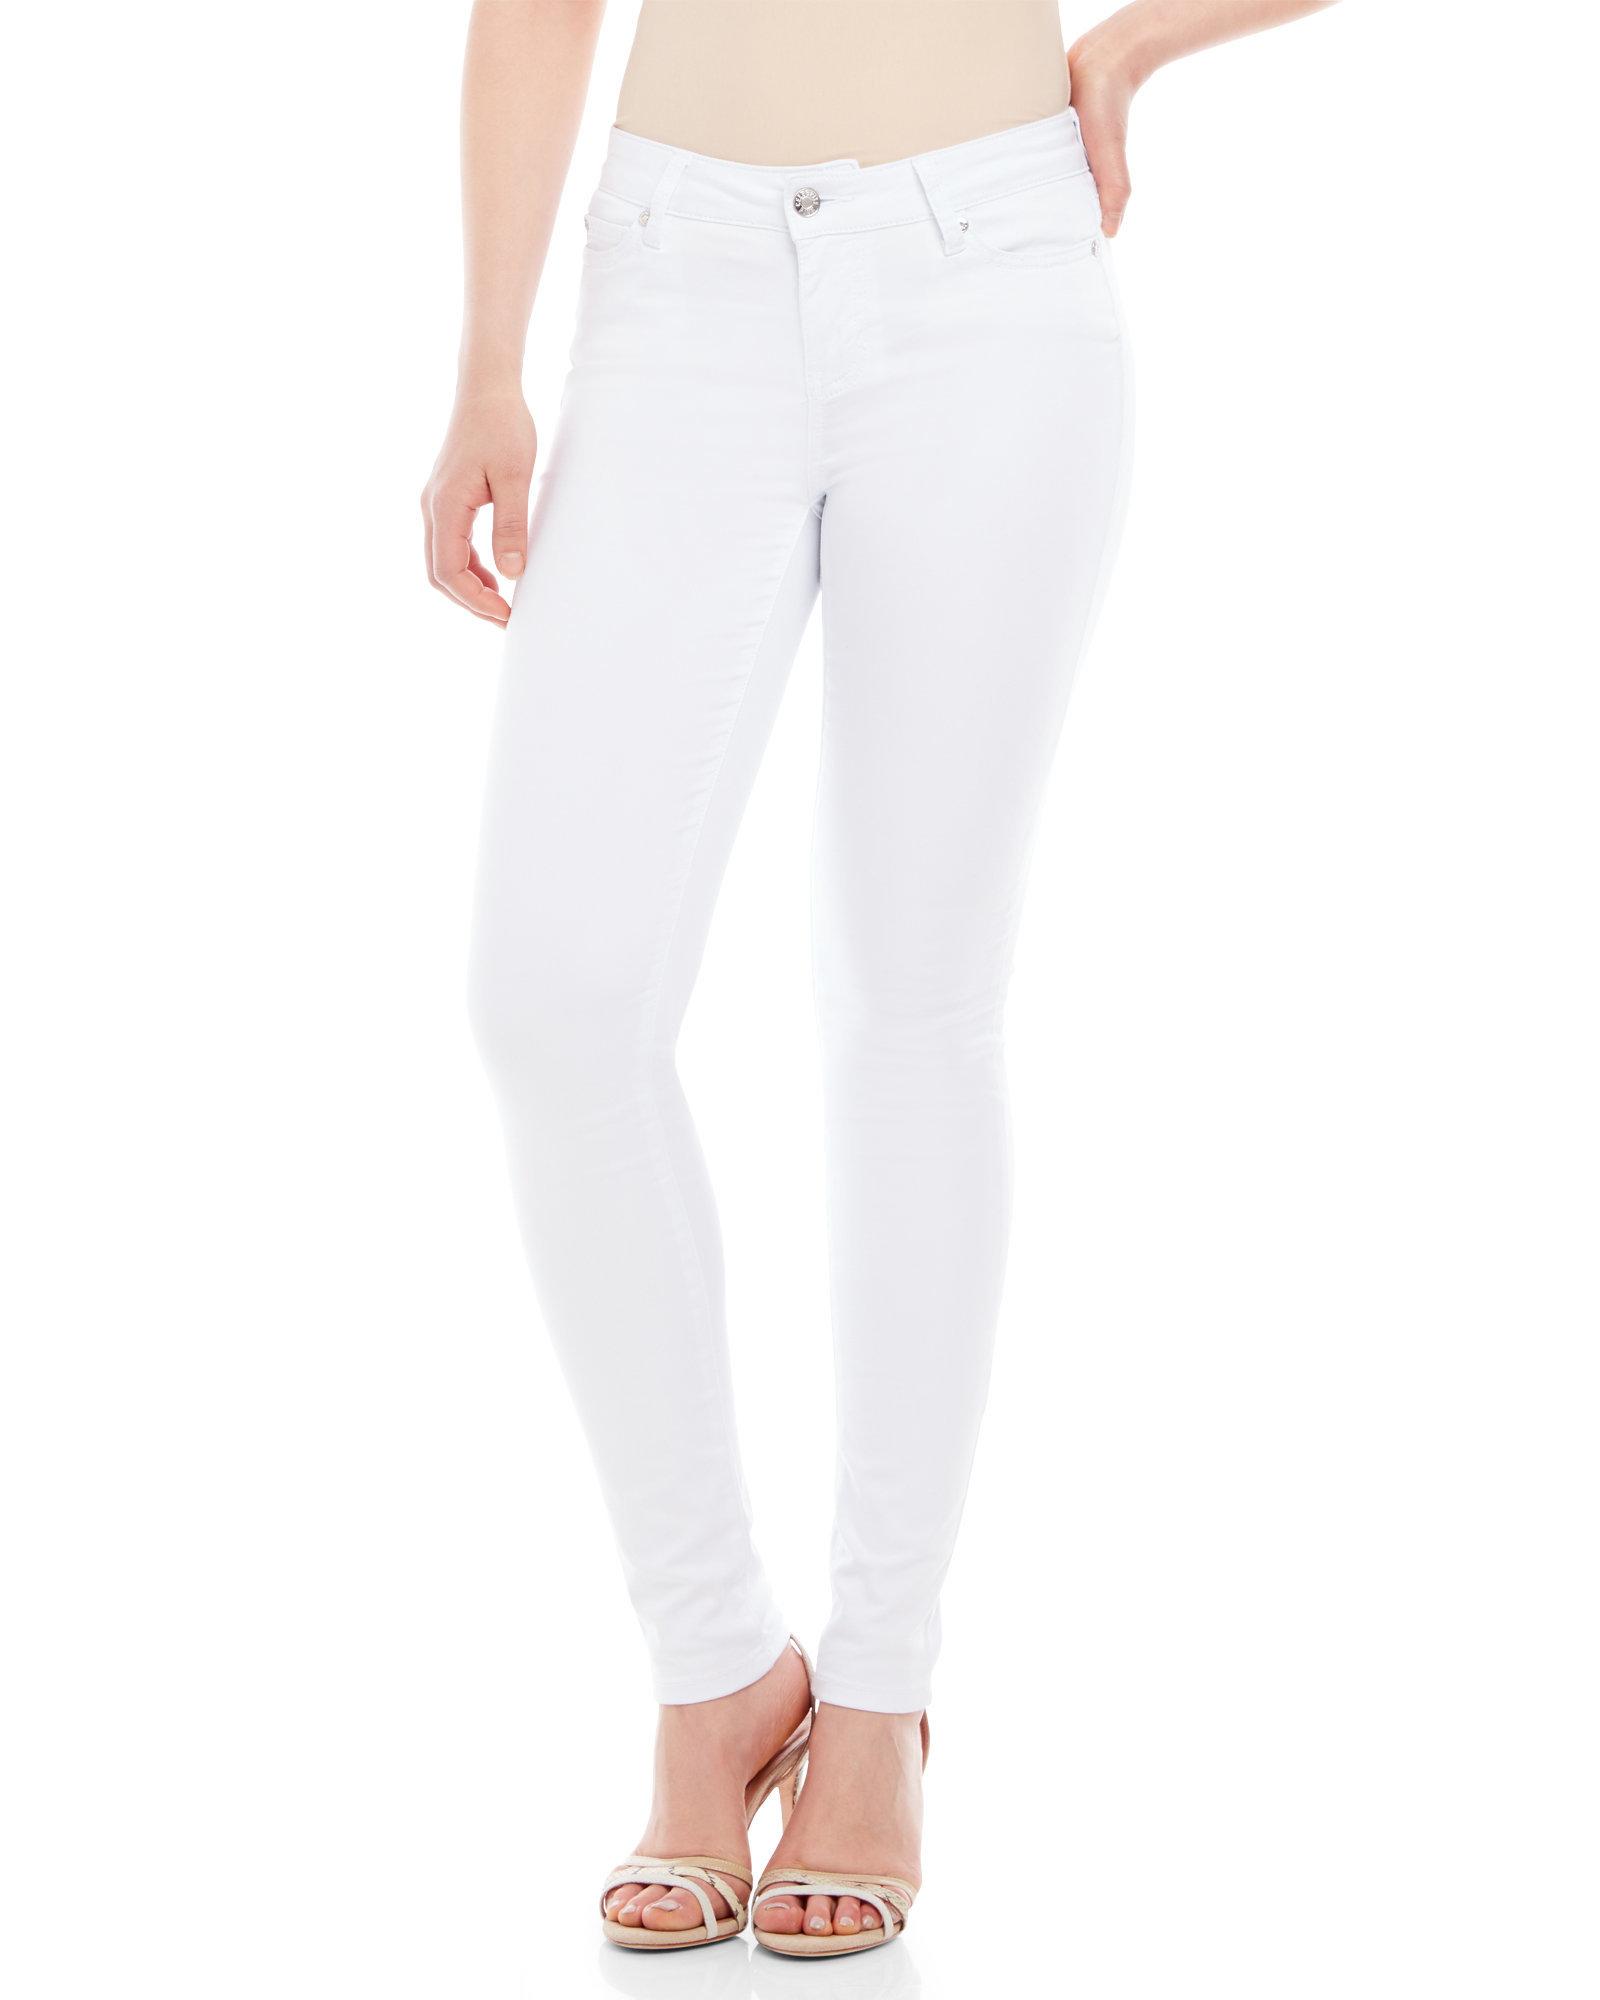 Amazon.com: celebrity pink white jeans